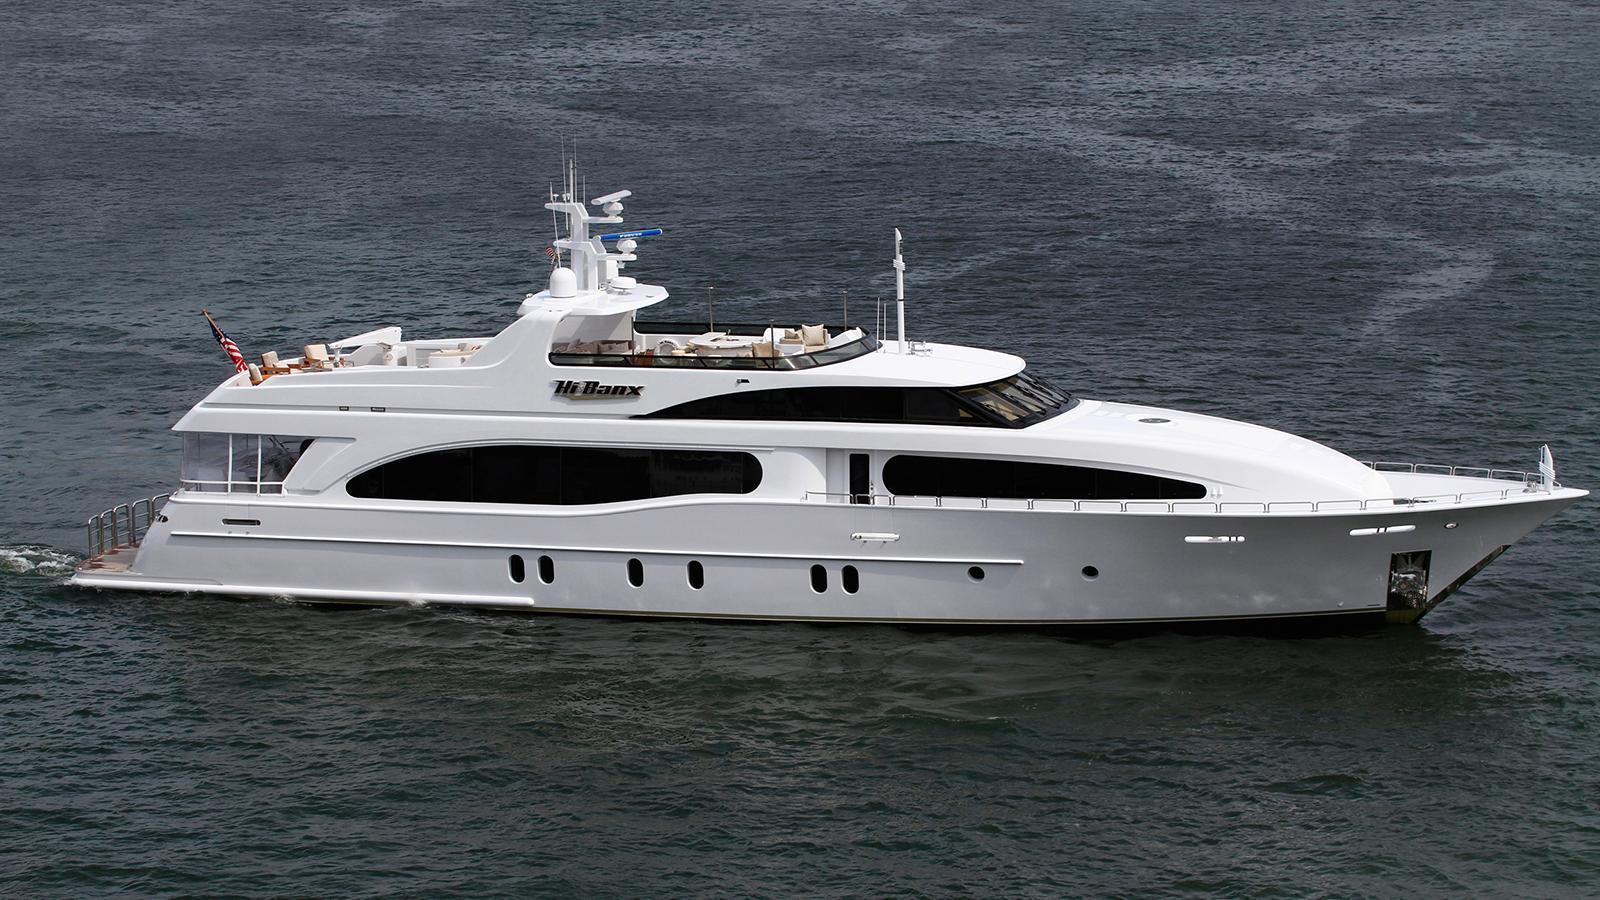 seament aquasition hi-banx motoryacht broward marine 2007 38m profile